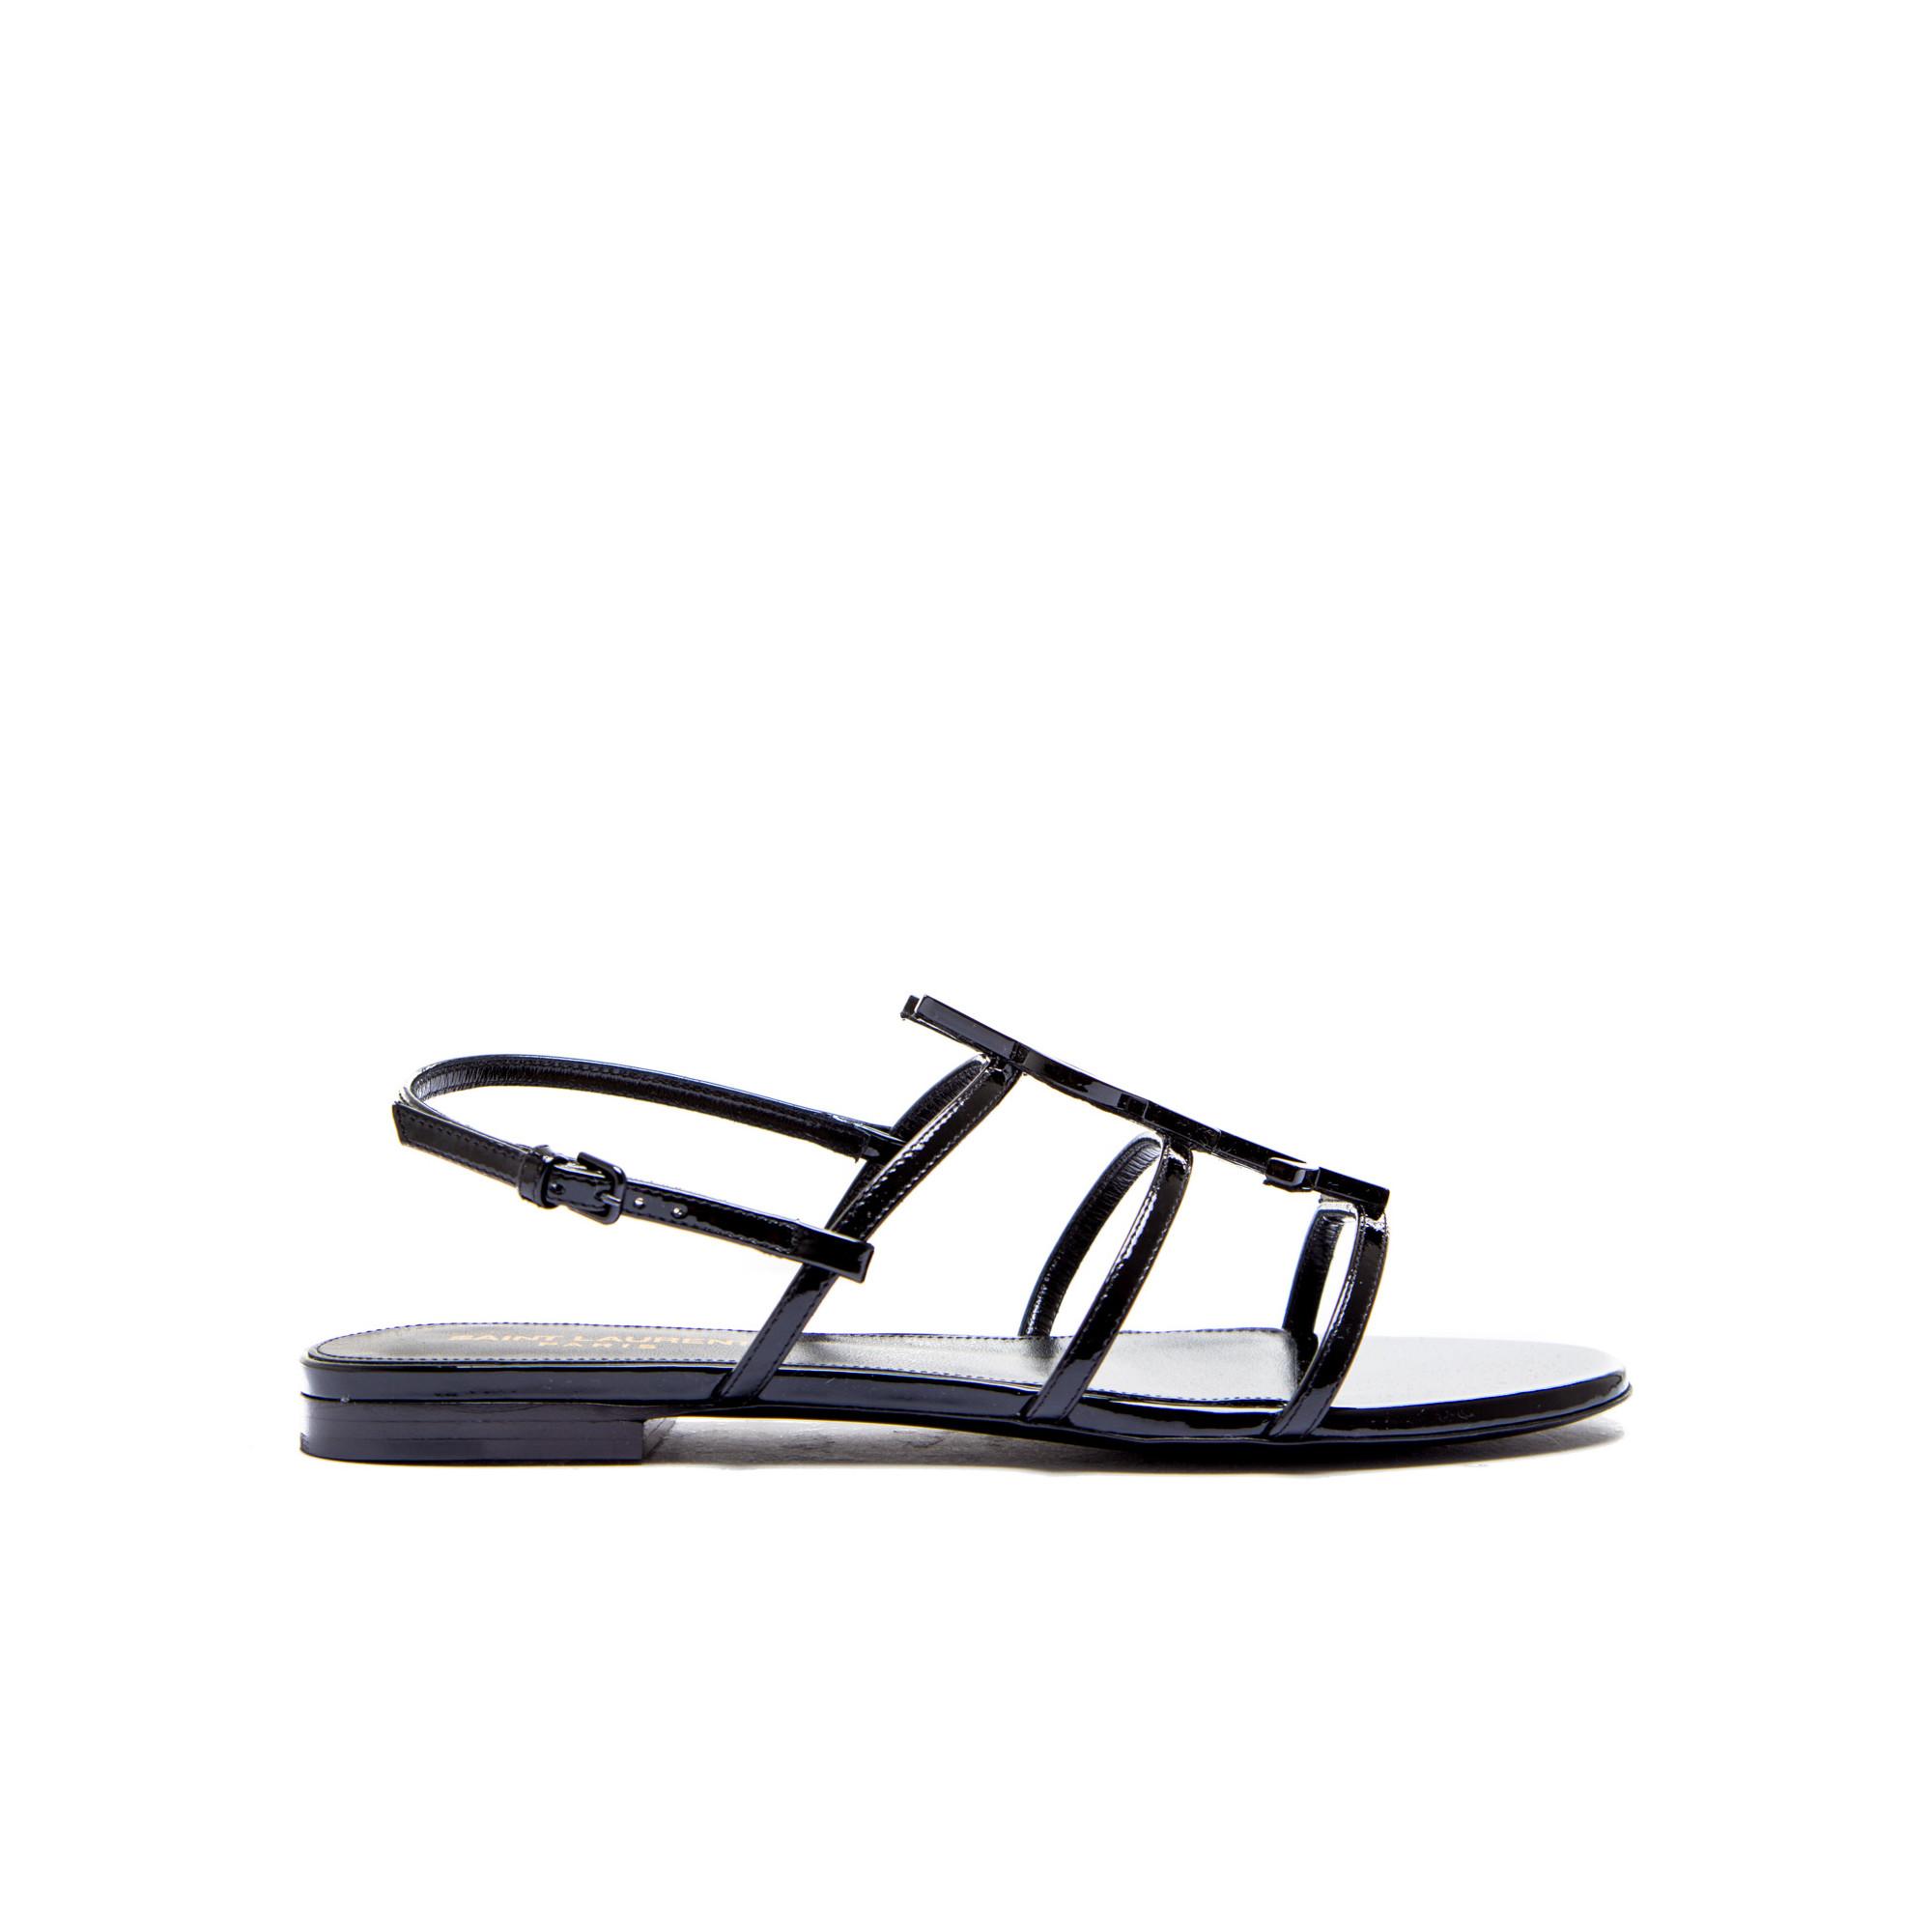 f2ea2466ecb96e Saint Laurent sandals cassandra 05 ysl black552245   0npvv   1000